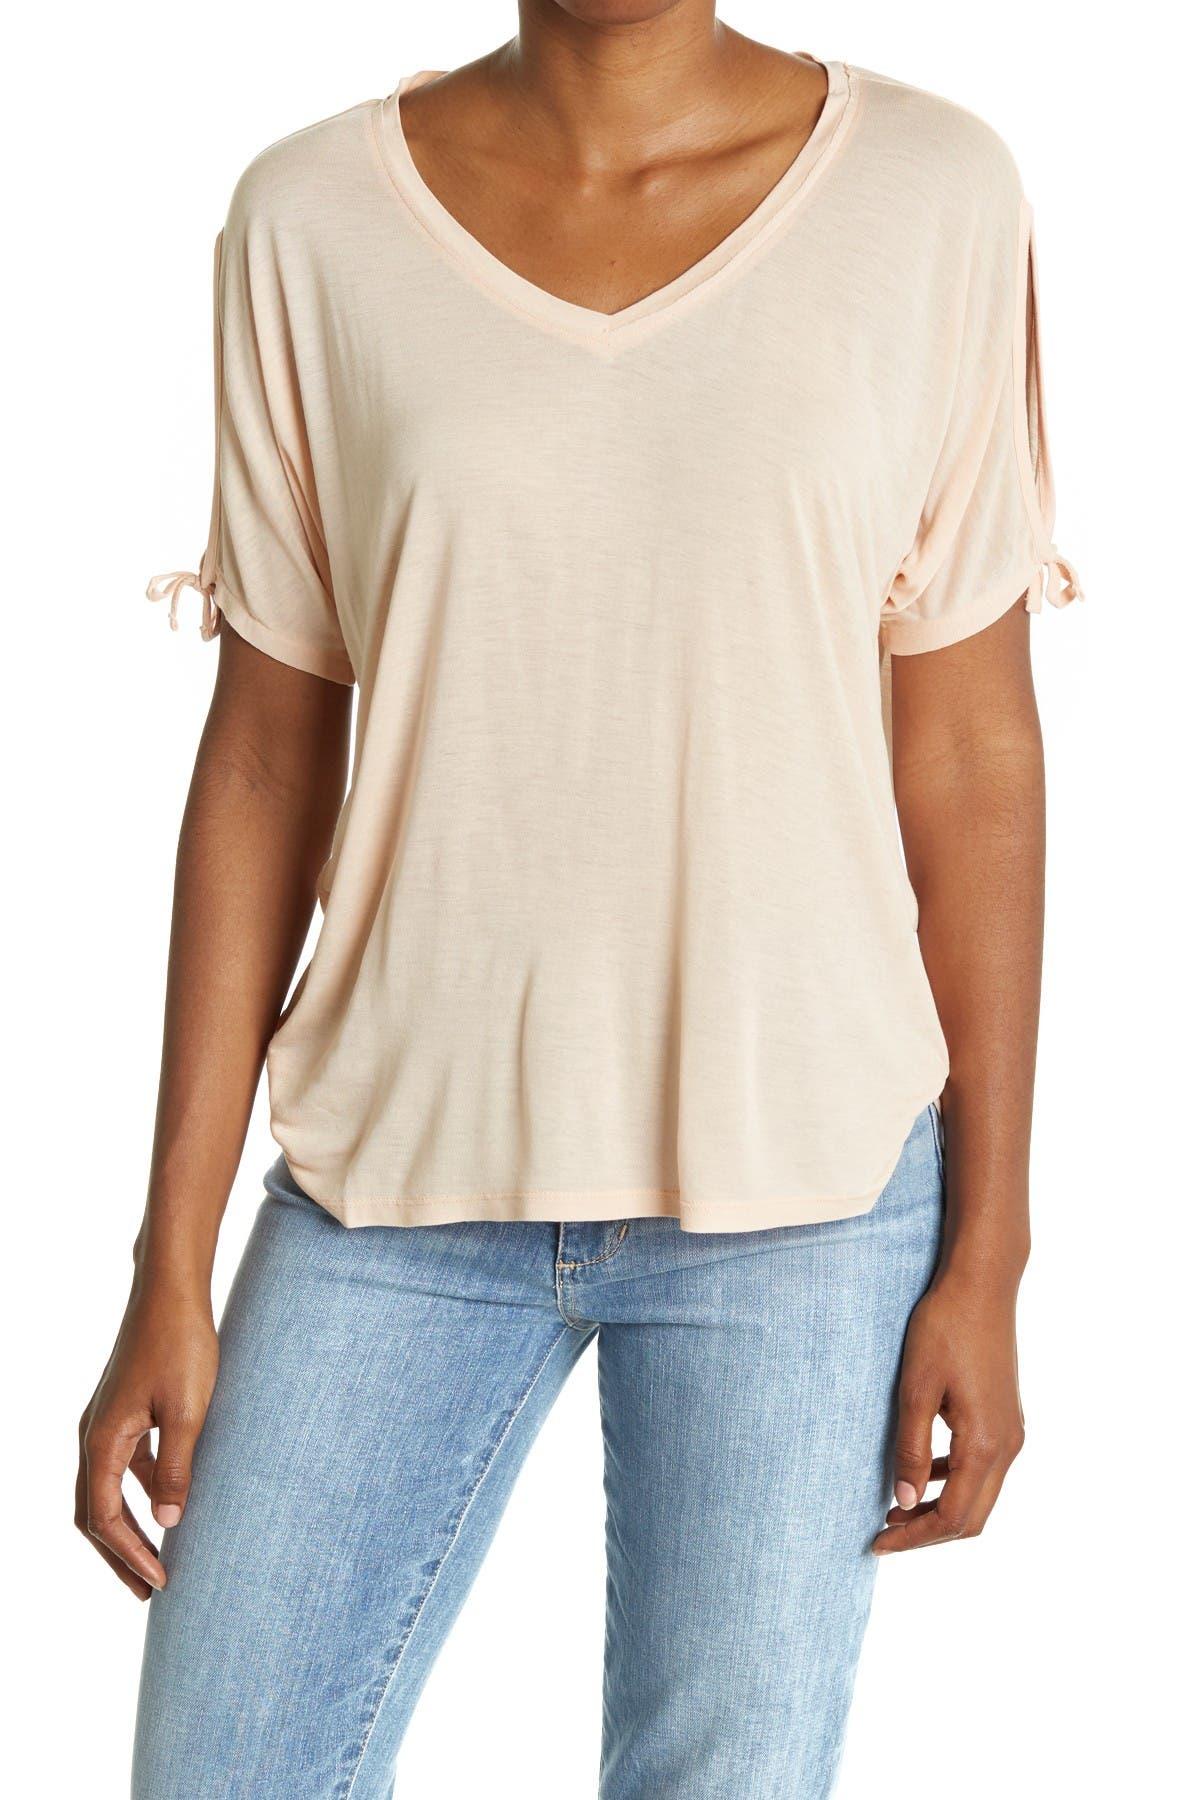 Image of ALLSAINTS Kay Tie Sleeve V-Neck T-Shirt